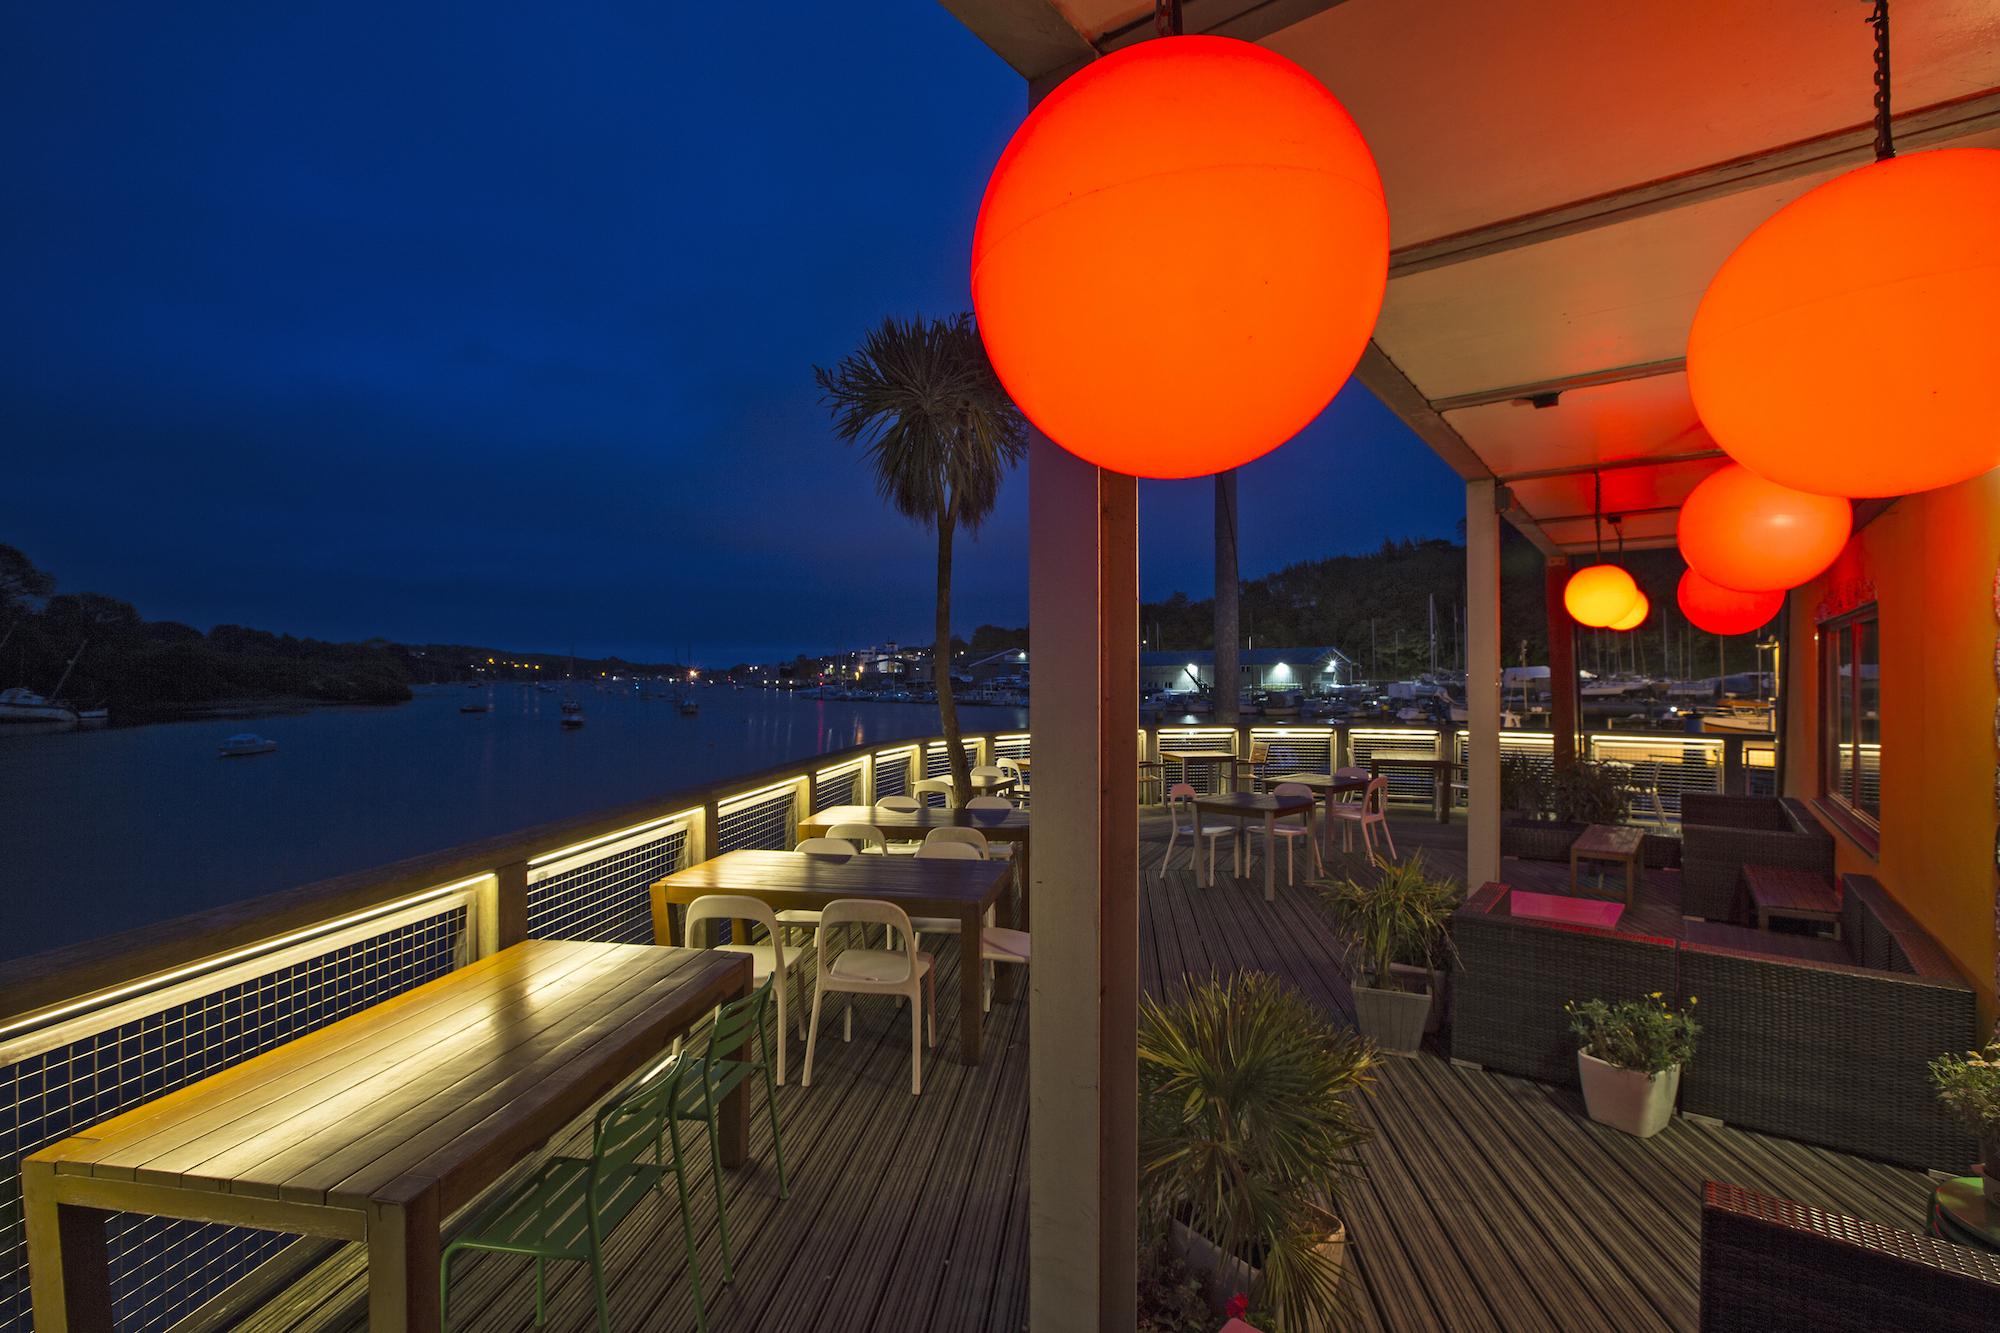 eleanor-bell-river-restaurant-lighting-muddy-beach.jpg